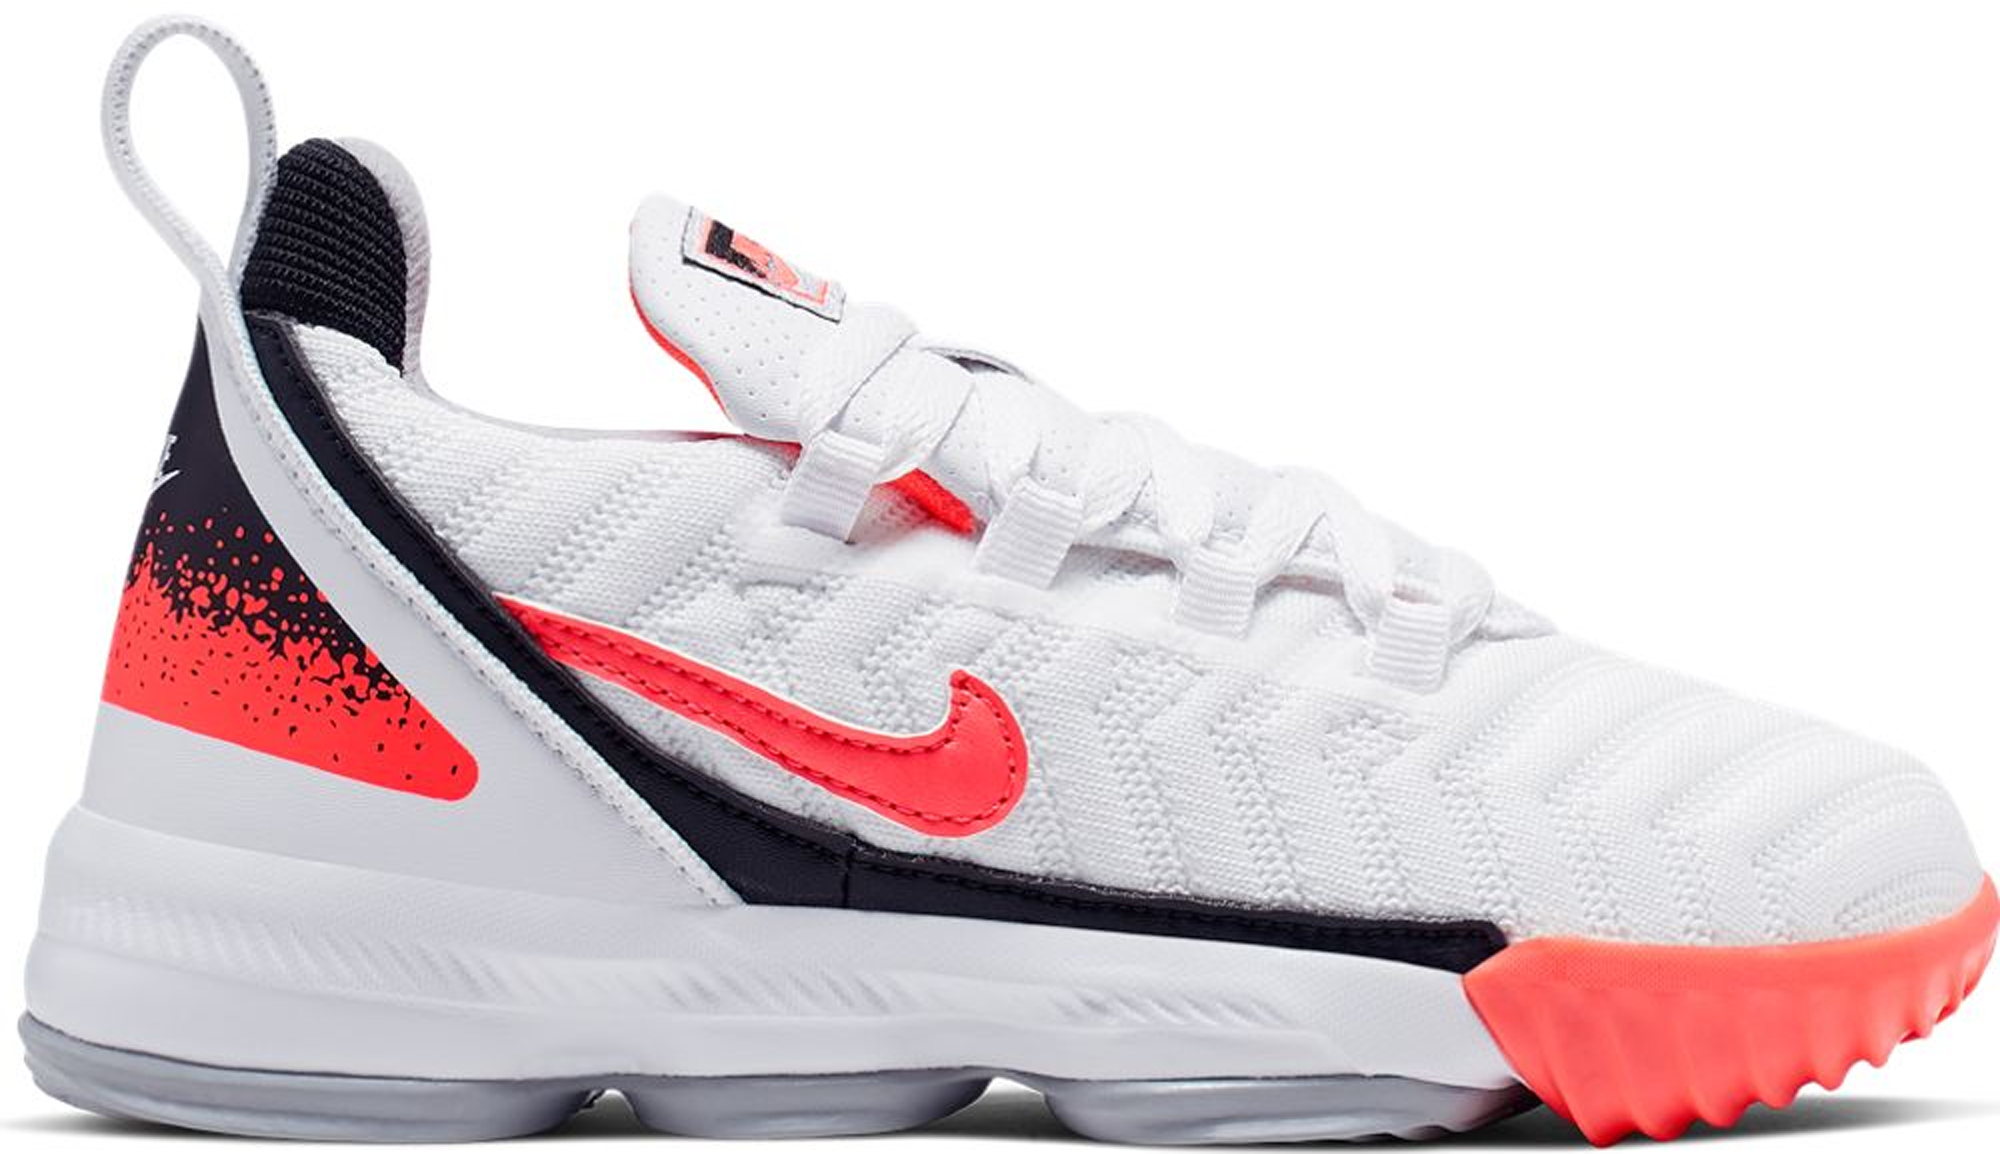 Nike LeBron 16 White Hot Lava (PS